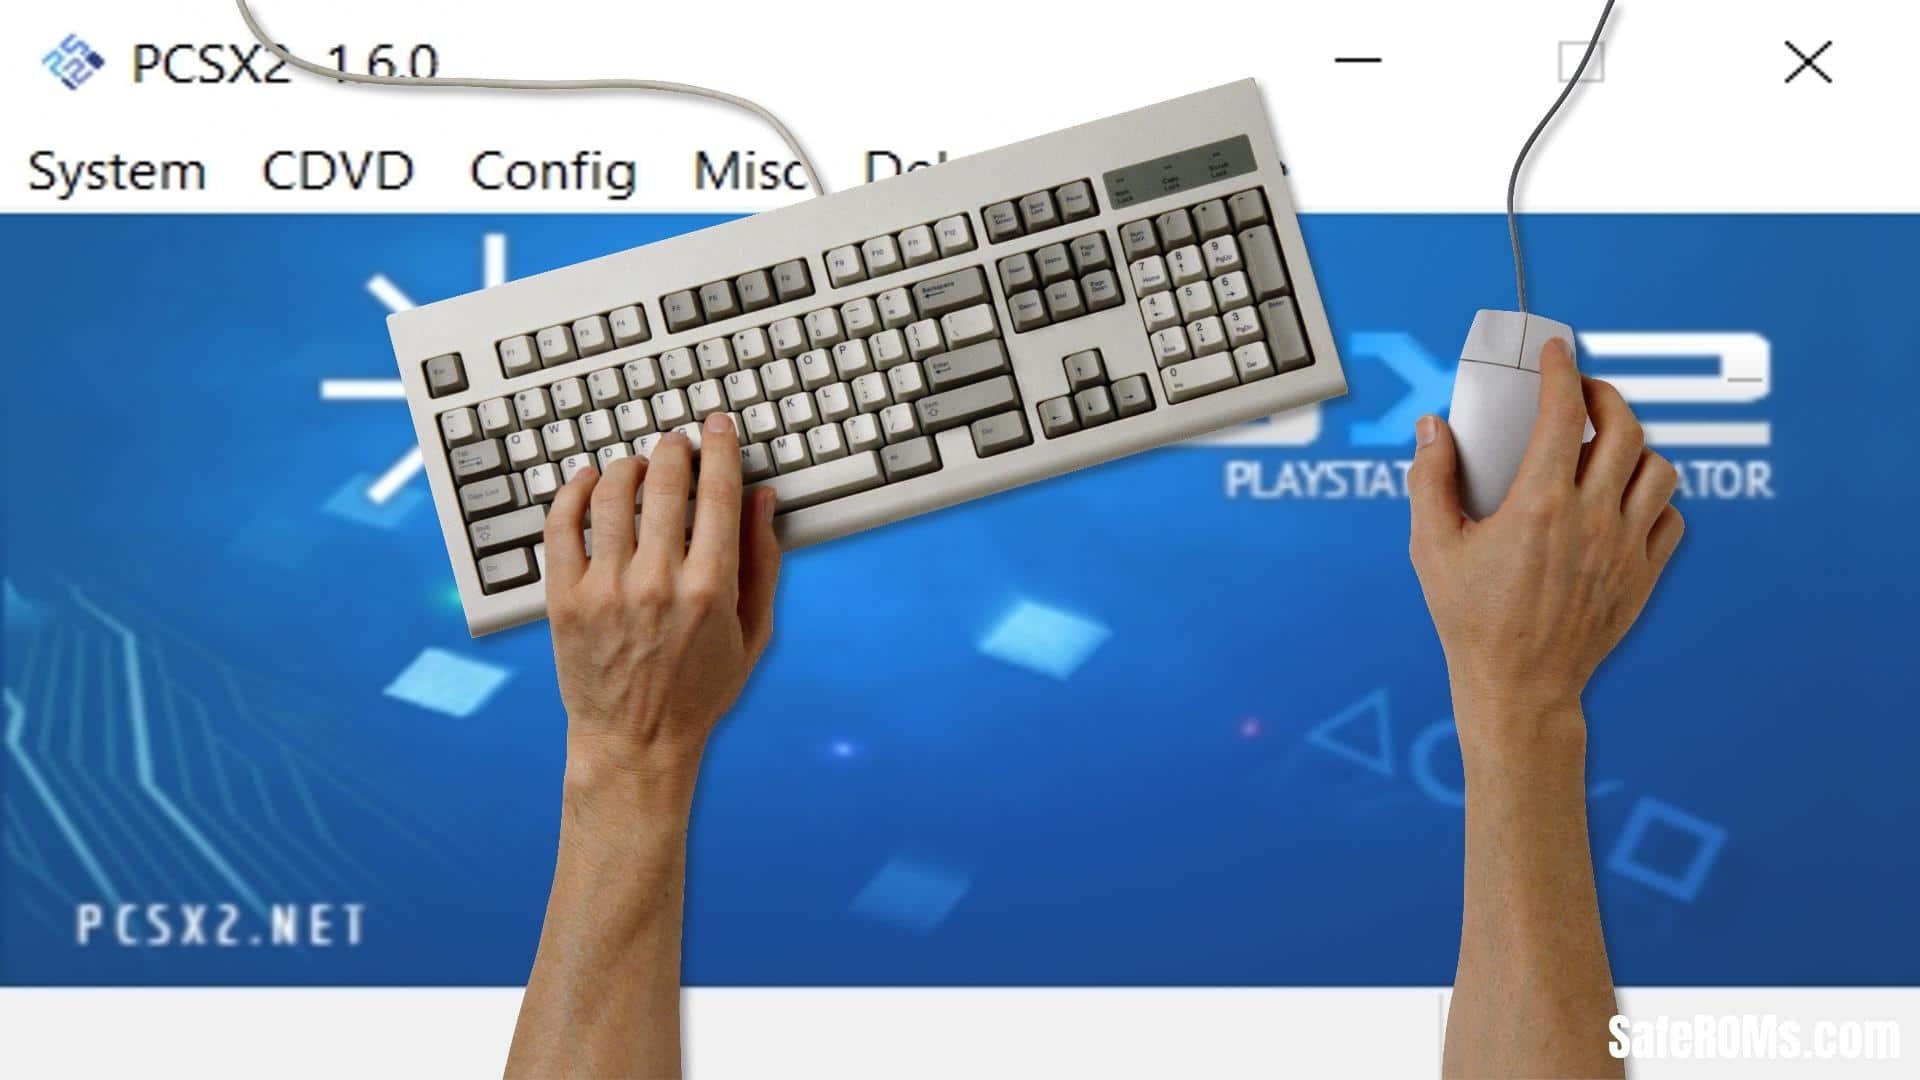 PCSX2 Keyboard Controls